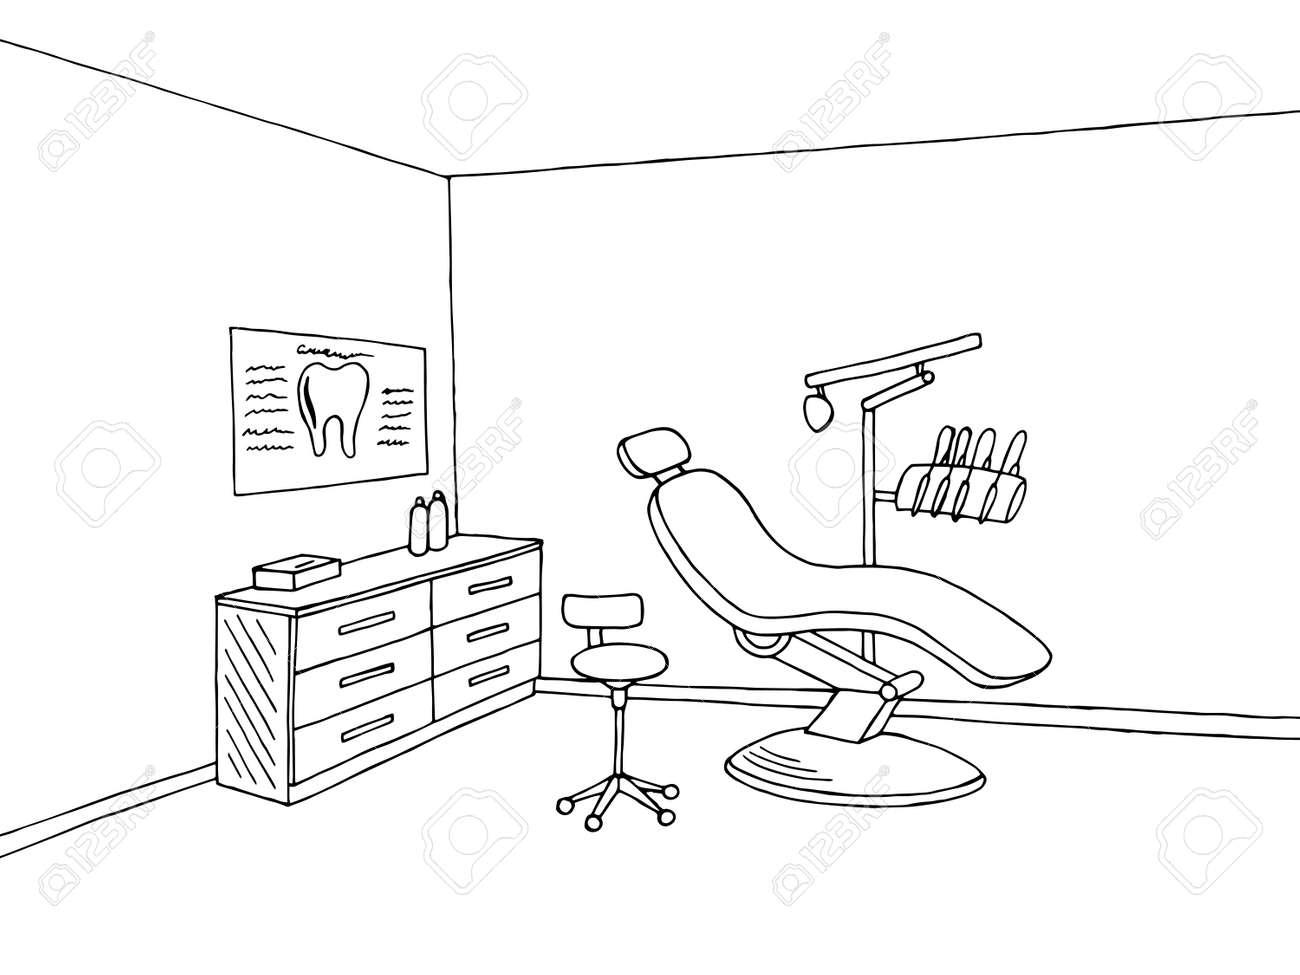 Zahnarzt Buro Klinik Grafik Schwarz Weiss Skizze Illustration Vektor